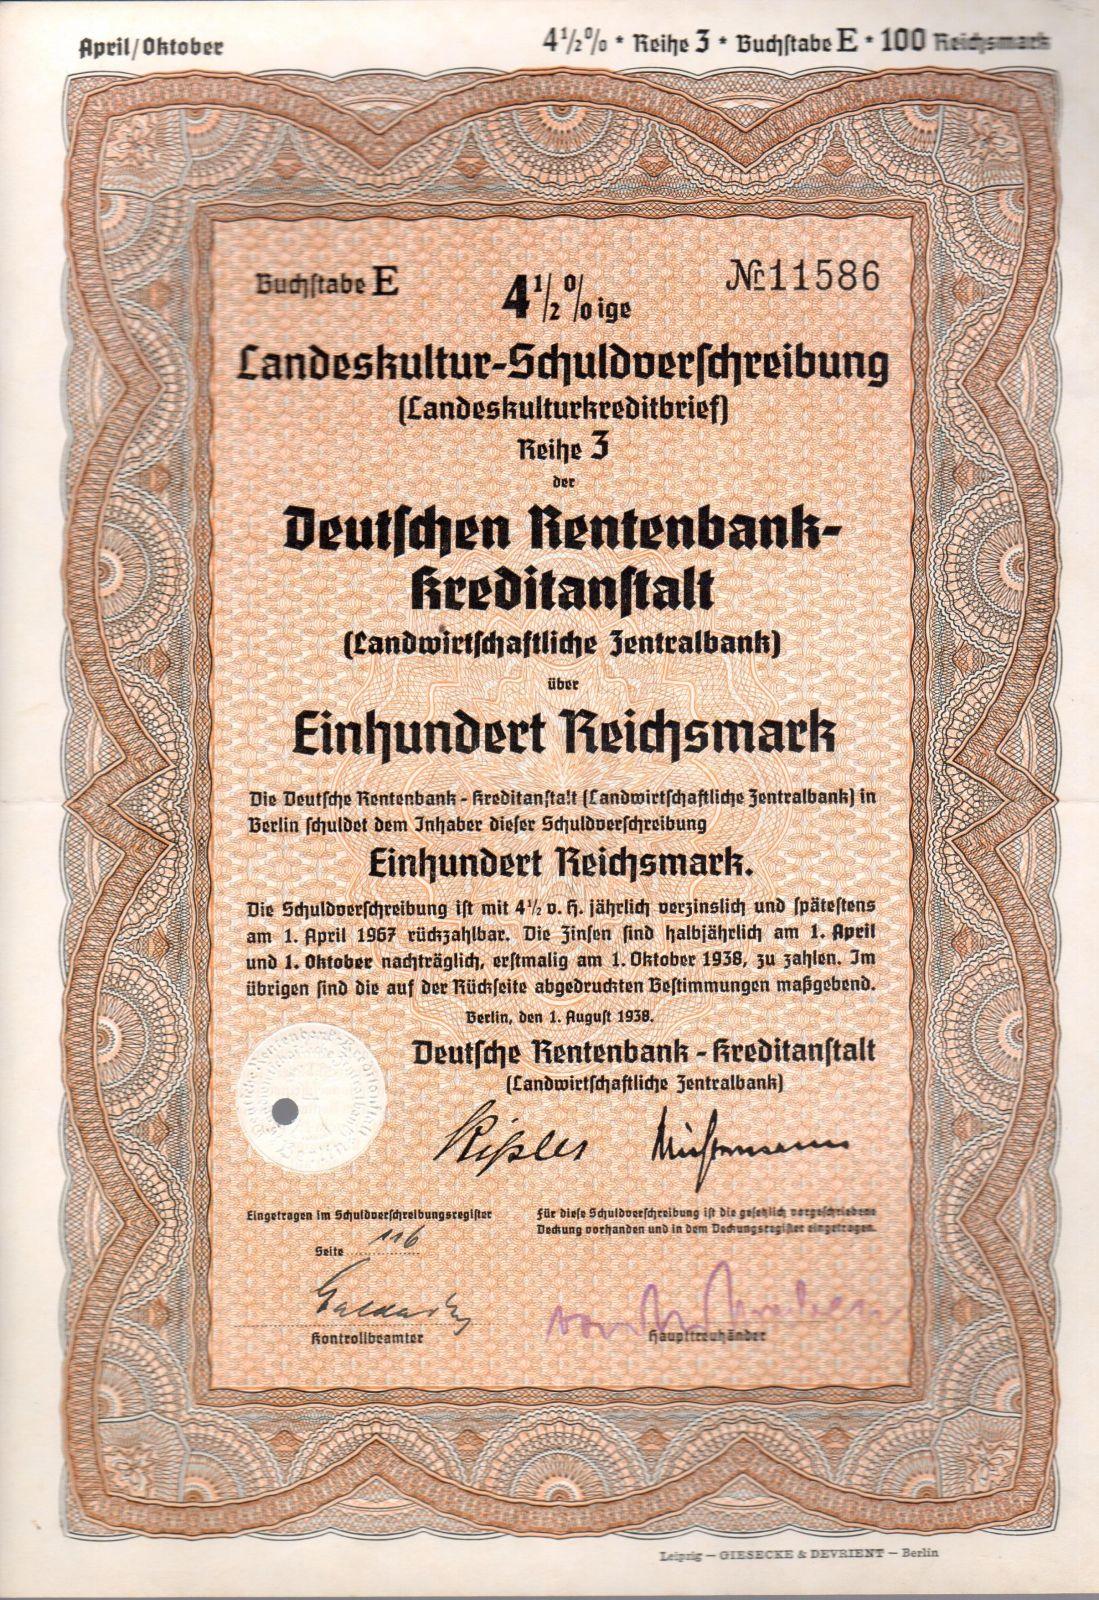 Dluhopis Deutschen Rentenbank Kreditanstalt, Berlín/1939/ 100 Reichsmark, 4 1/2%, formát A4